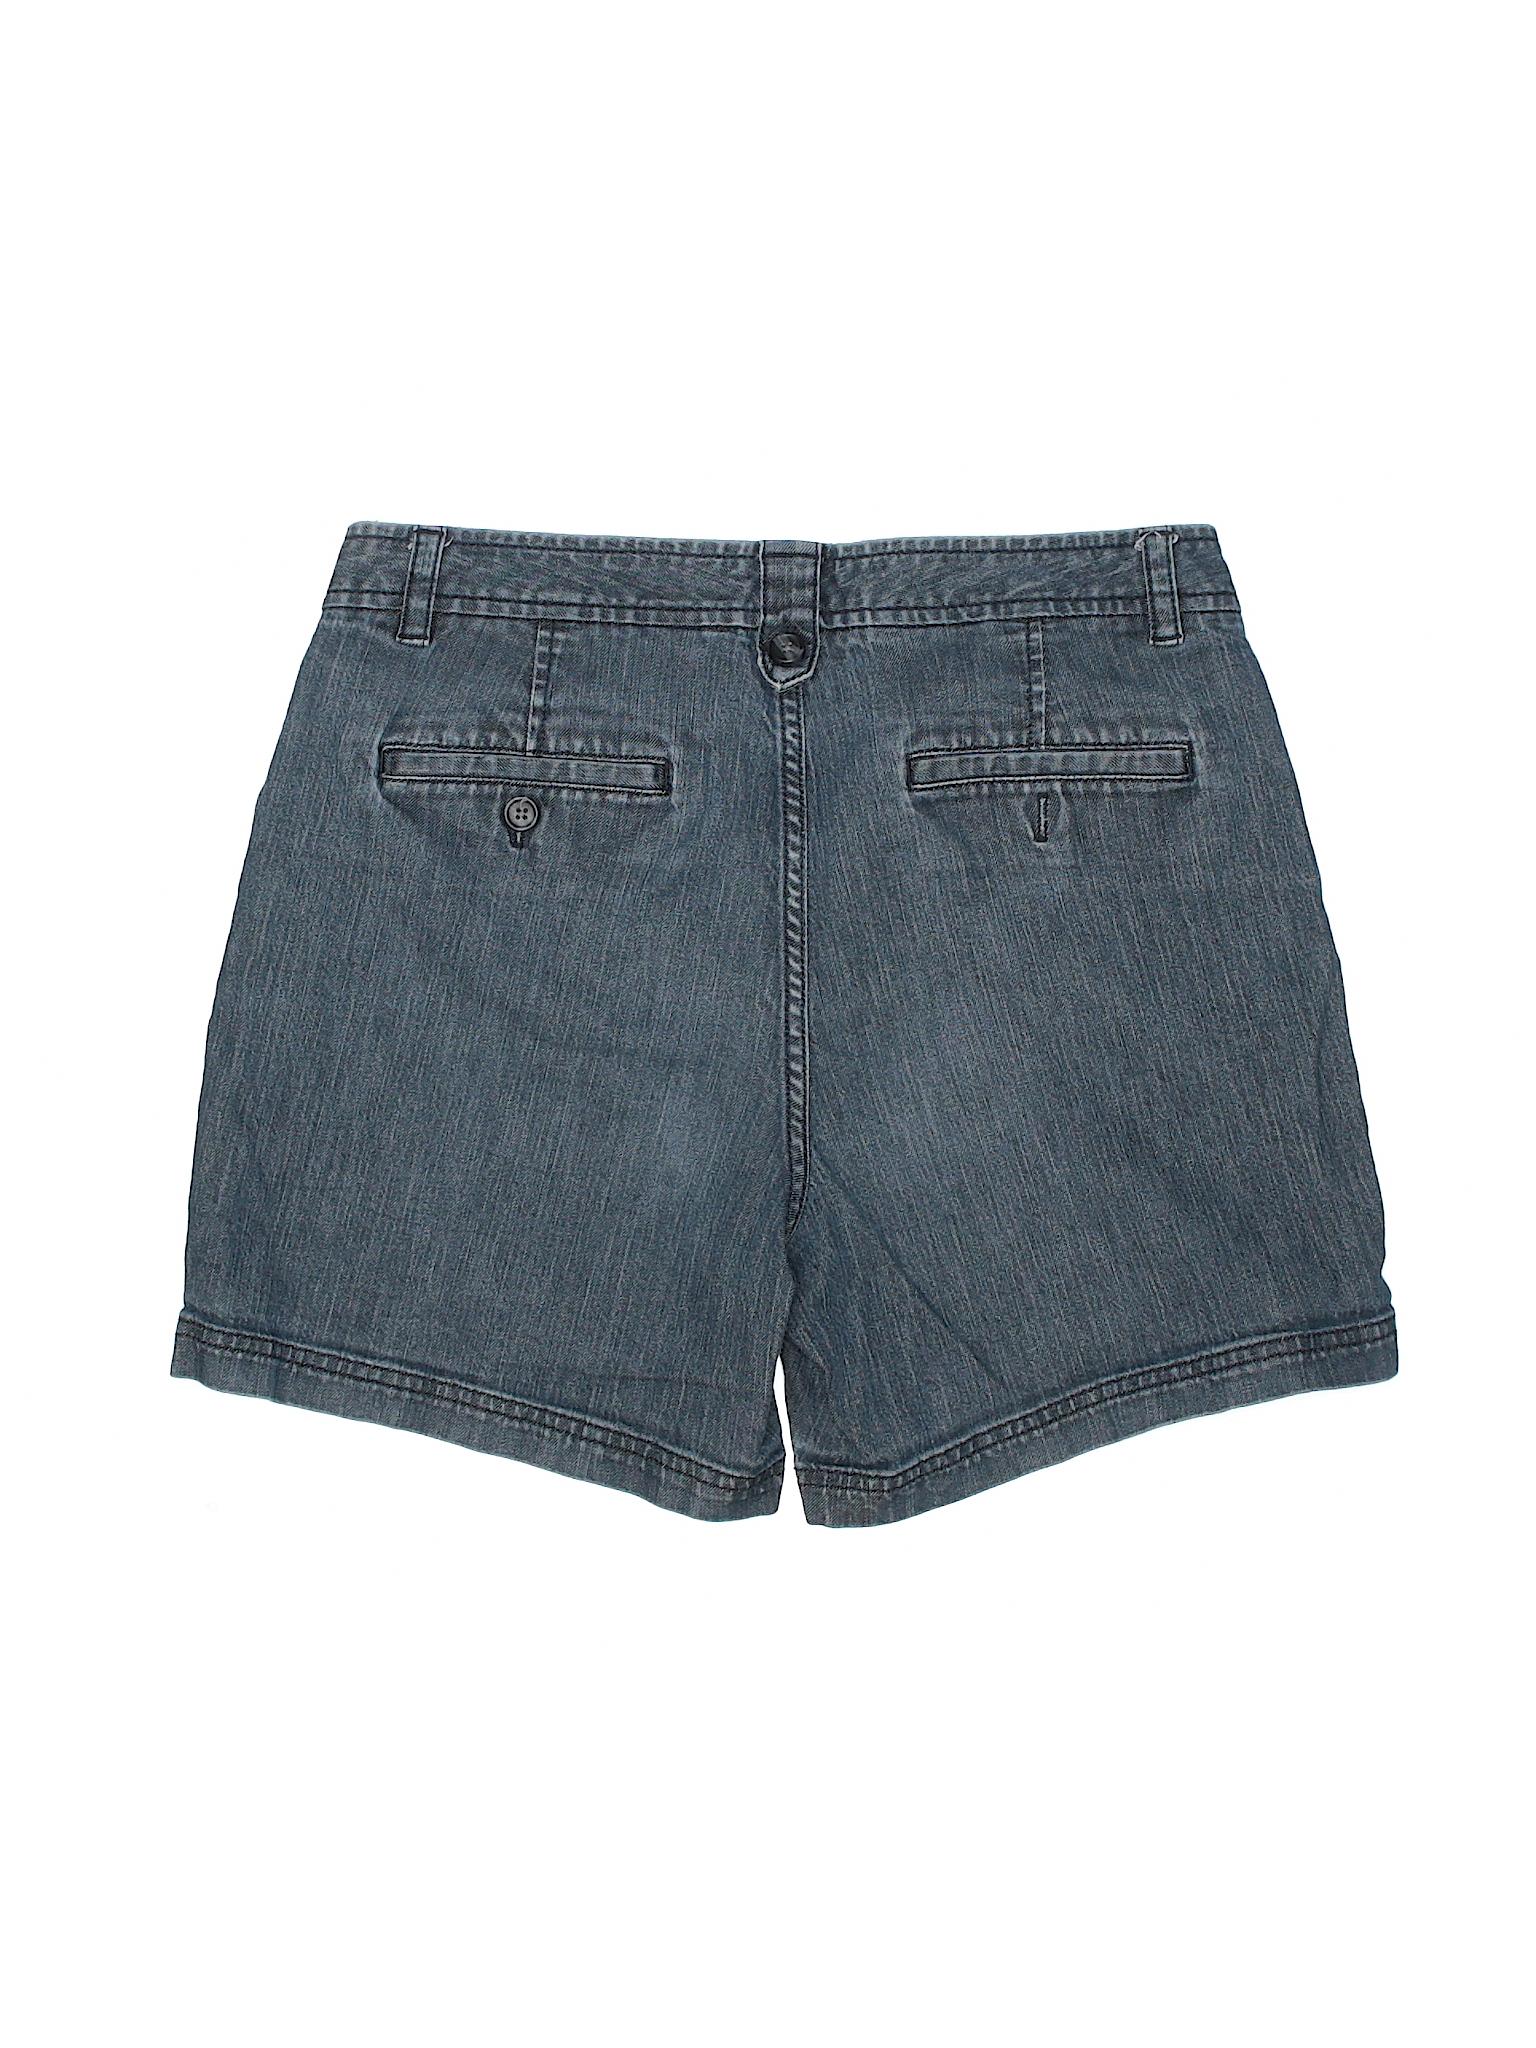 Shorts Denim Shorts Dockers Denim Dockers Shorts Dockers Boutique Boutique Boutique Denim dcE1WAg